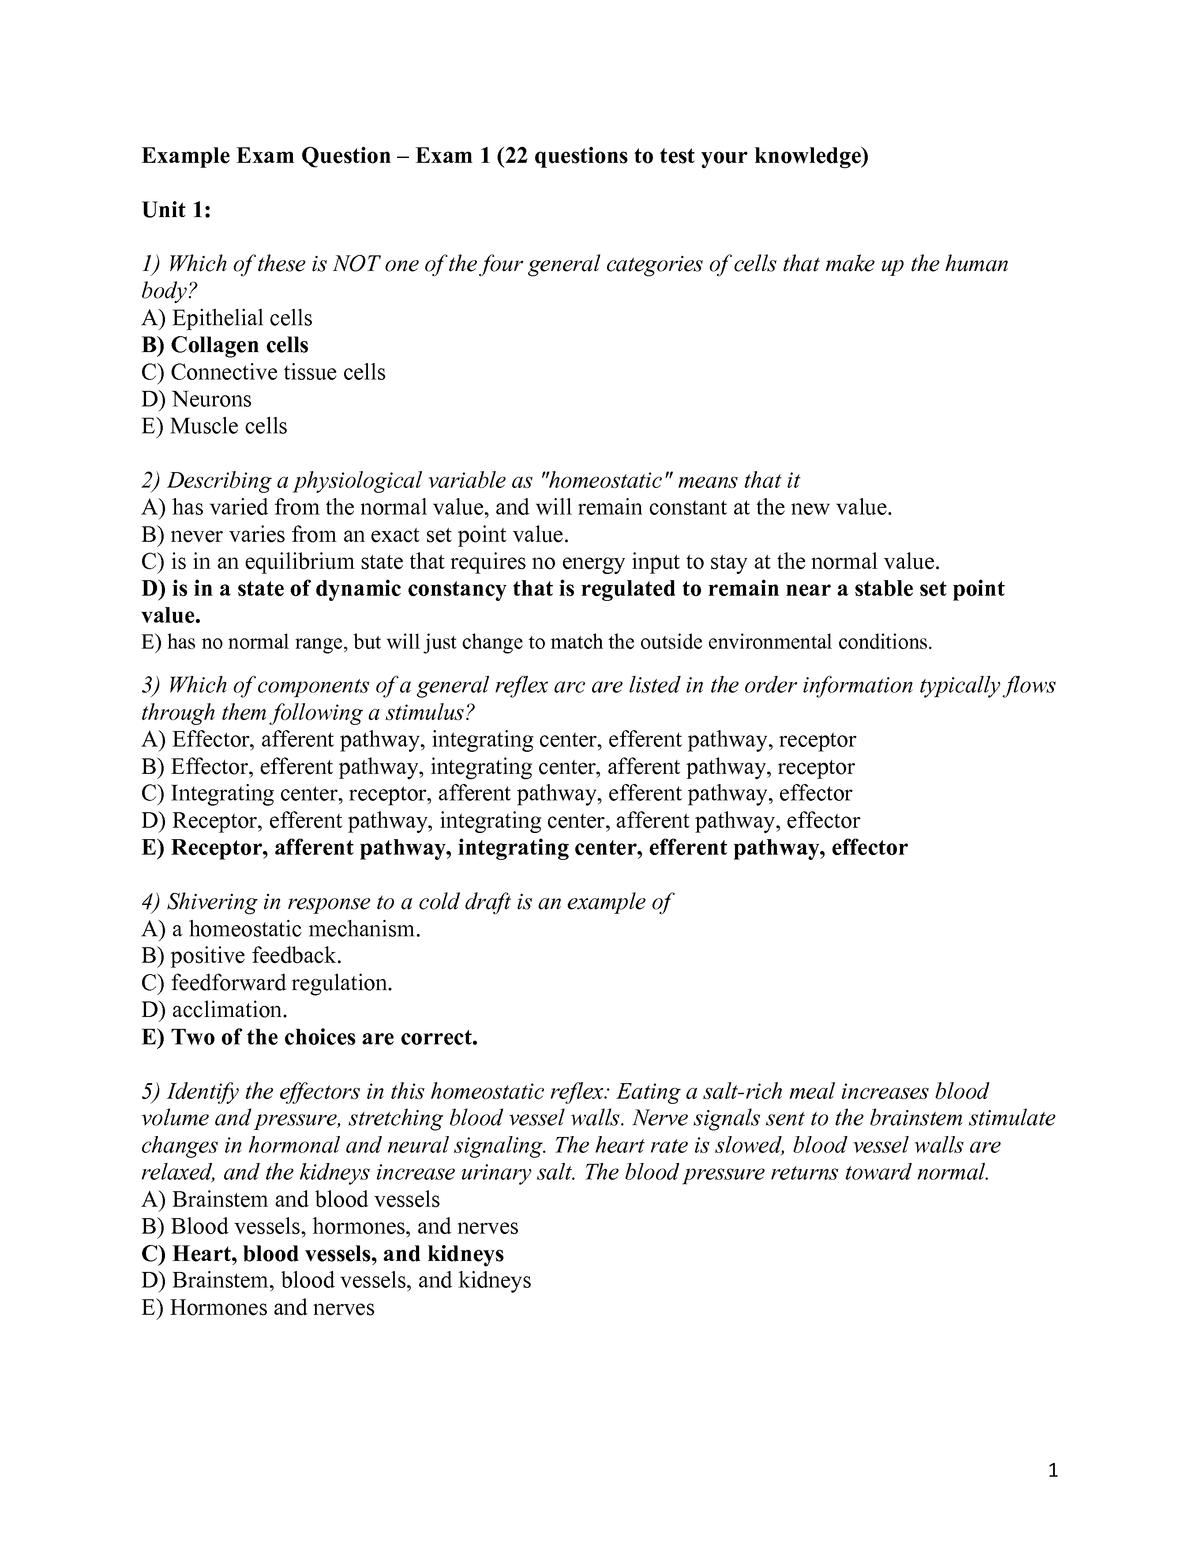 Exam Exam 1 February 1 2019, questions and answers - StuDocu